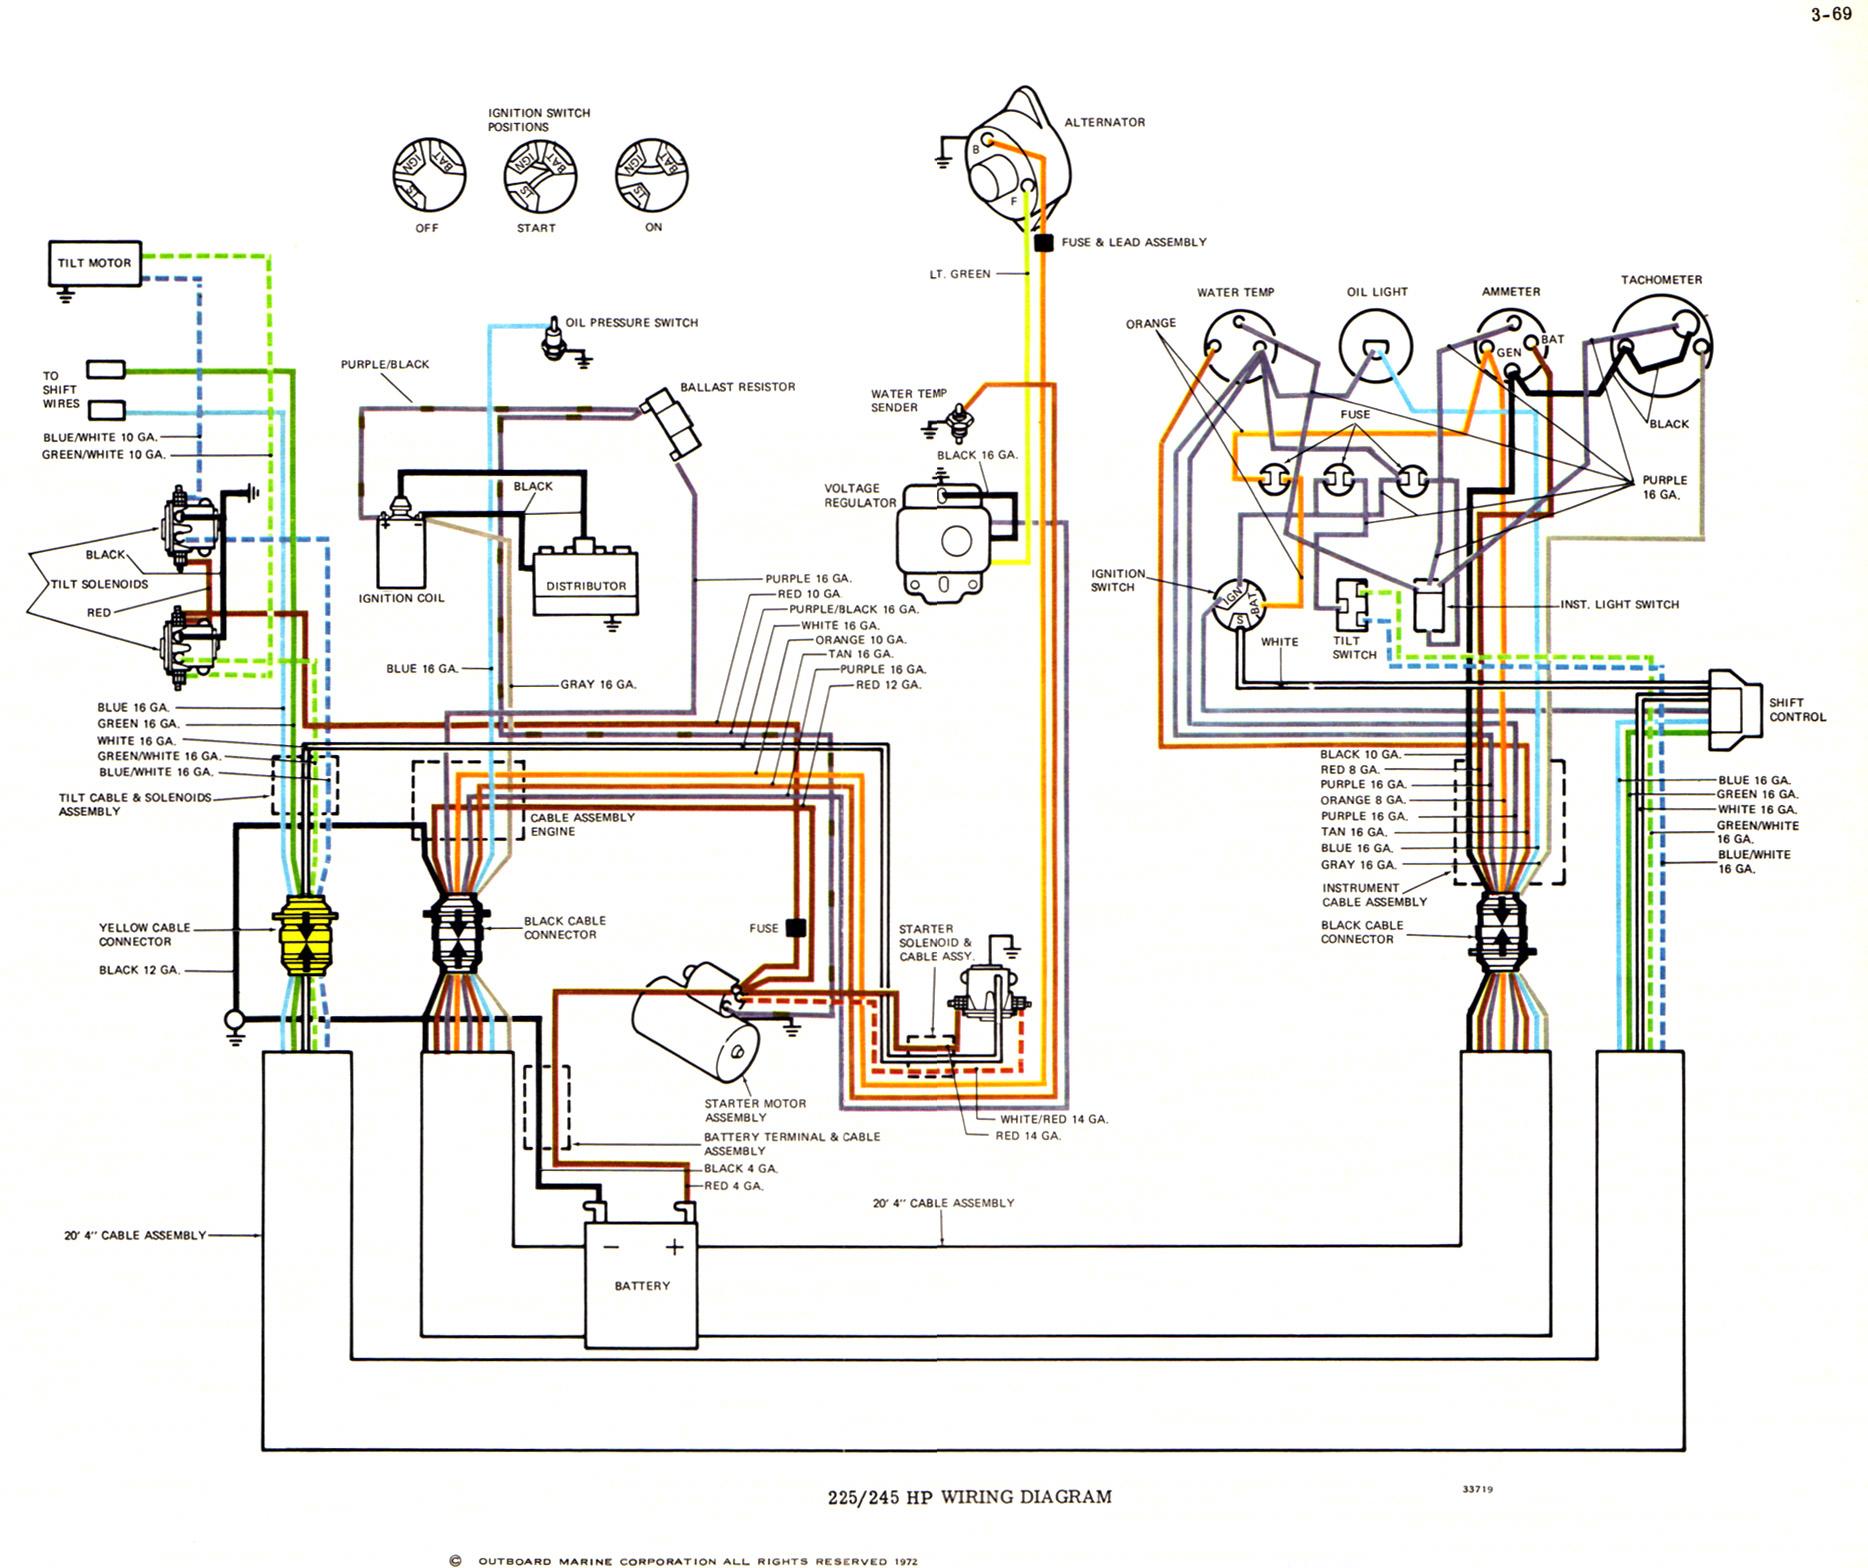 Yamaha Outboard Tach Wiring | Manual E-Books - Yamaha Outboard Tachometer Wiring Diagram